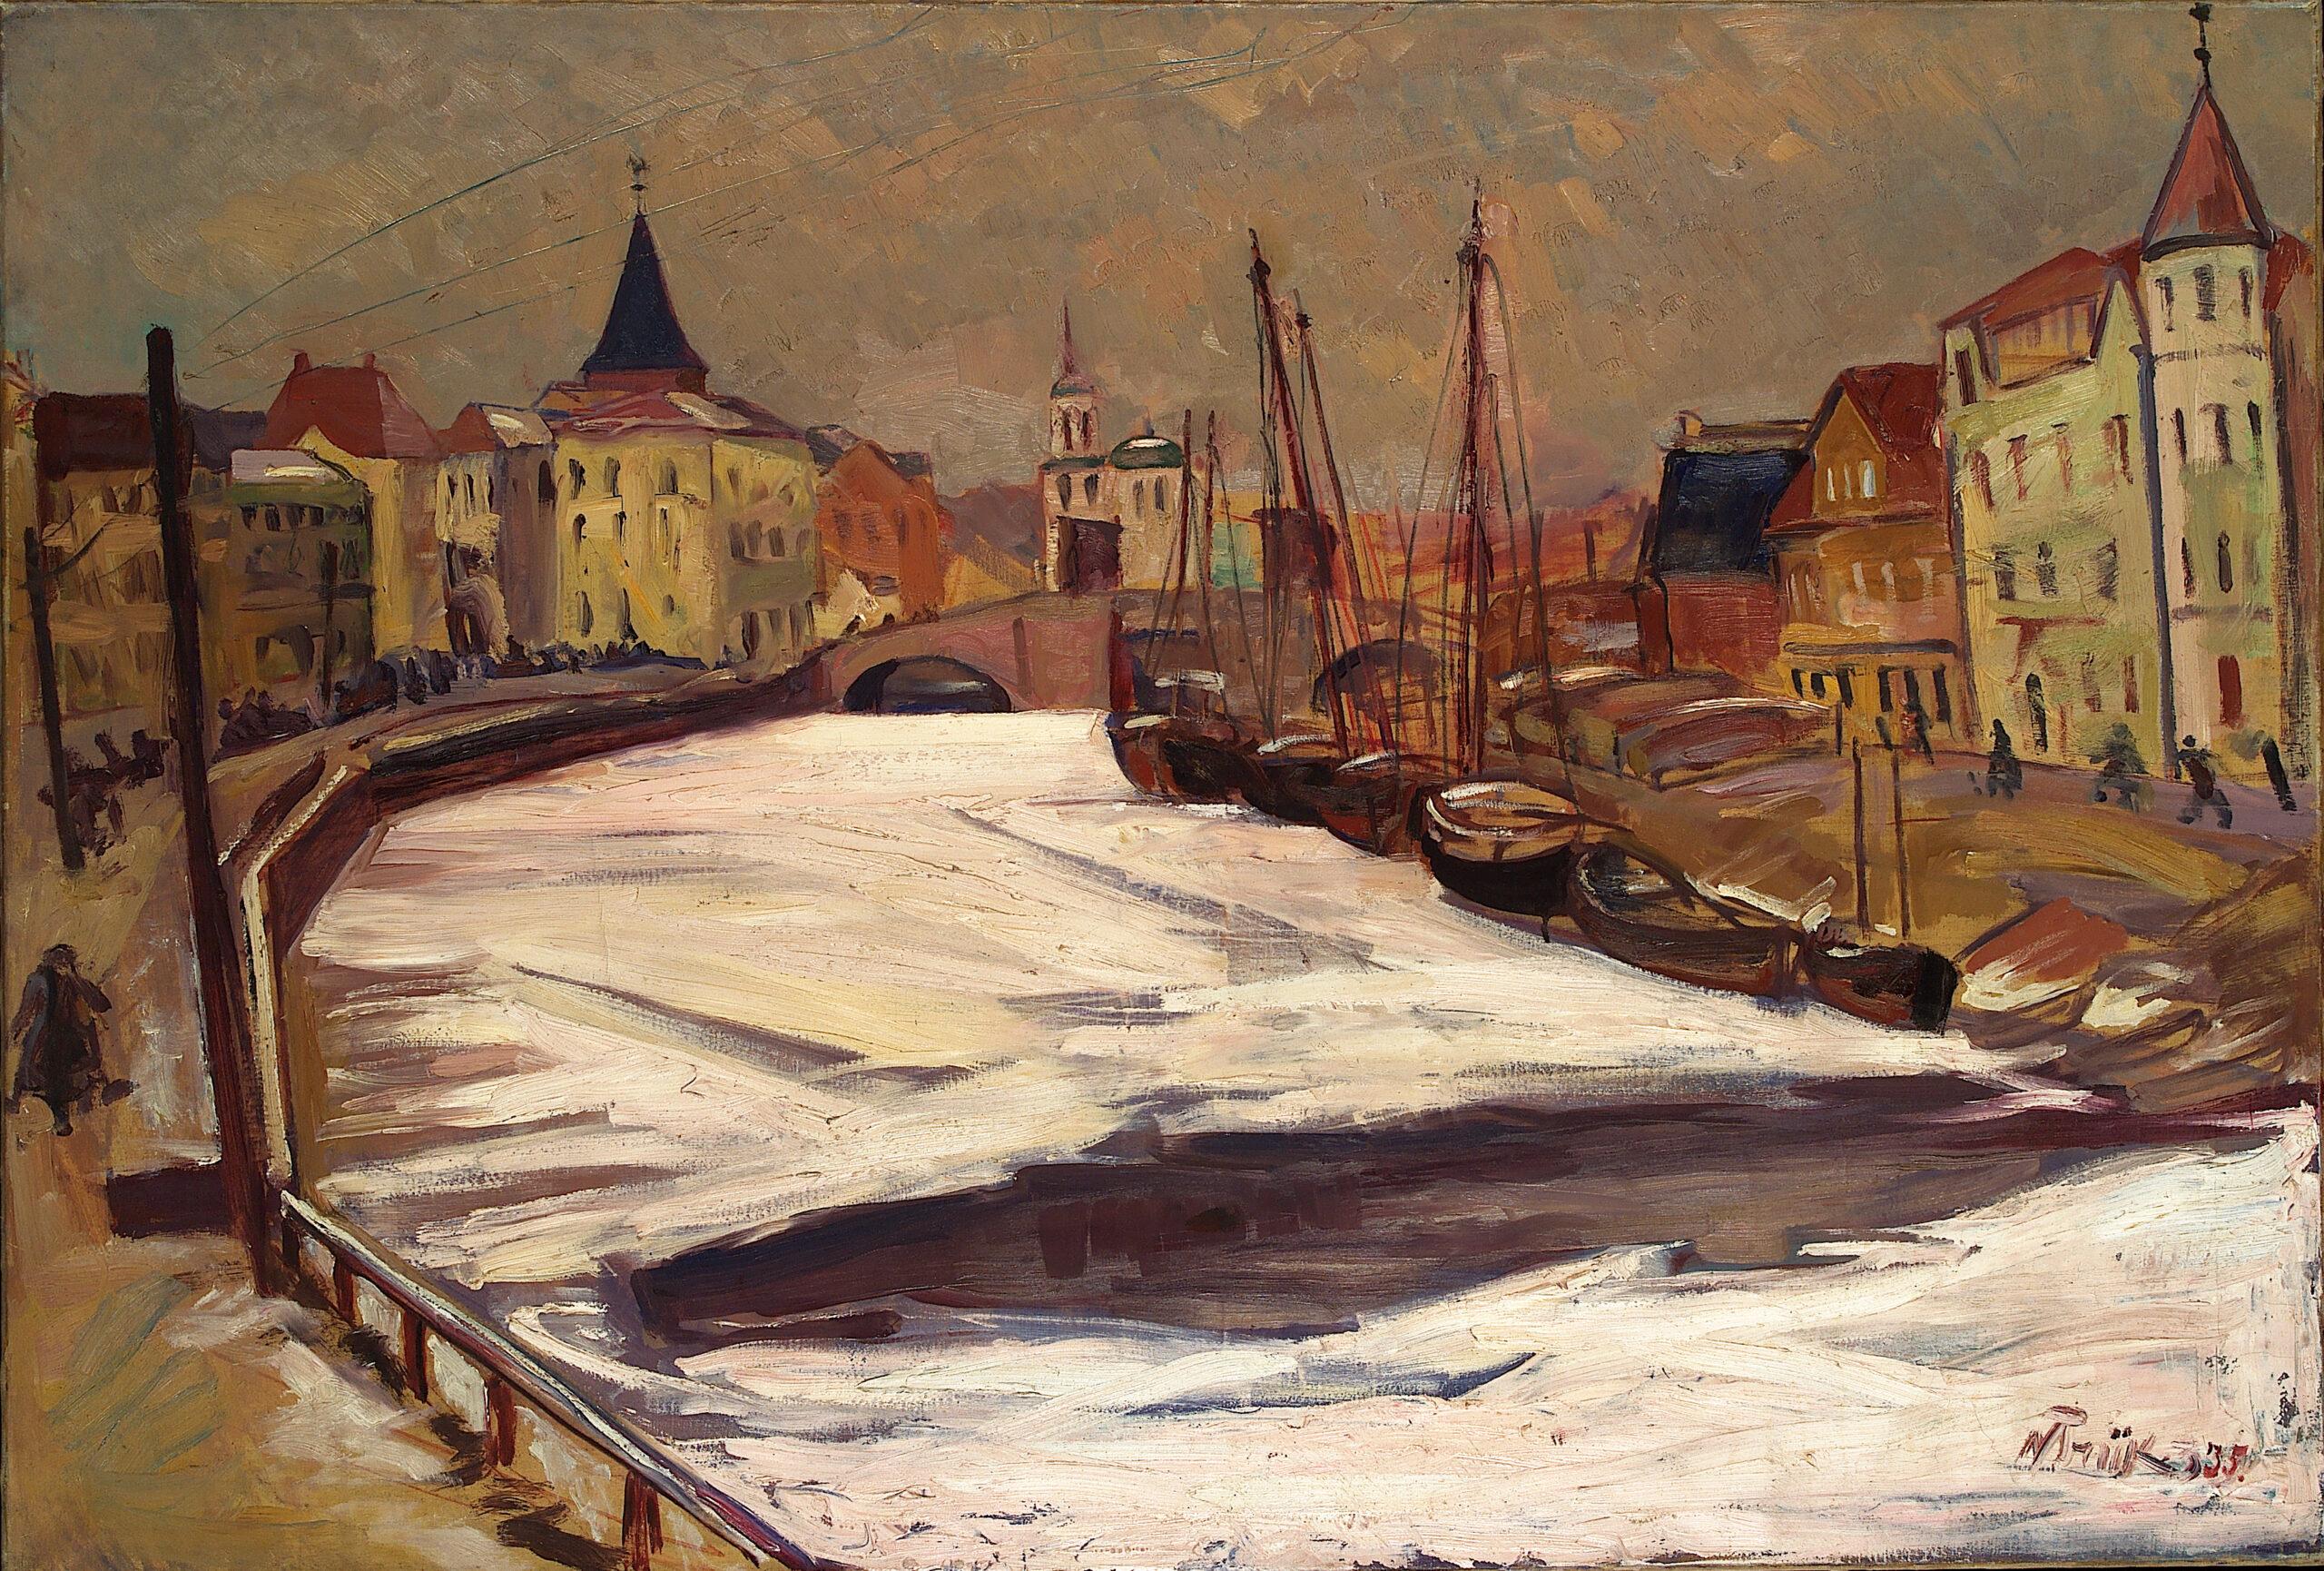 TALVINE TARTU EMAJÕEGA | 1935 | ÕLI LÕUENDIL